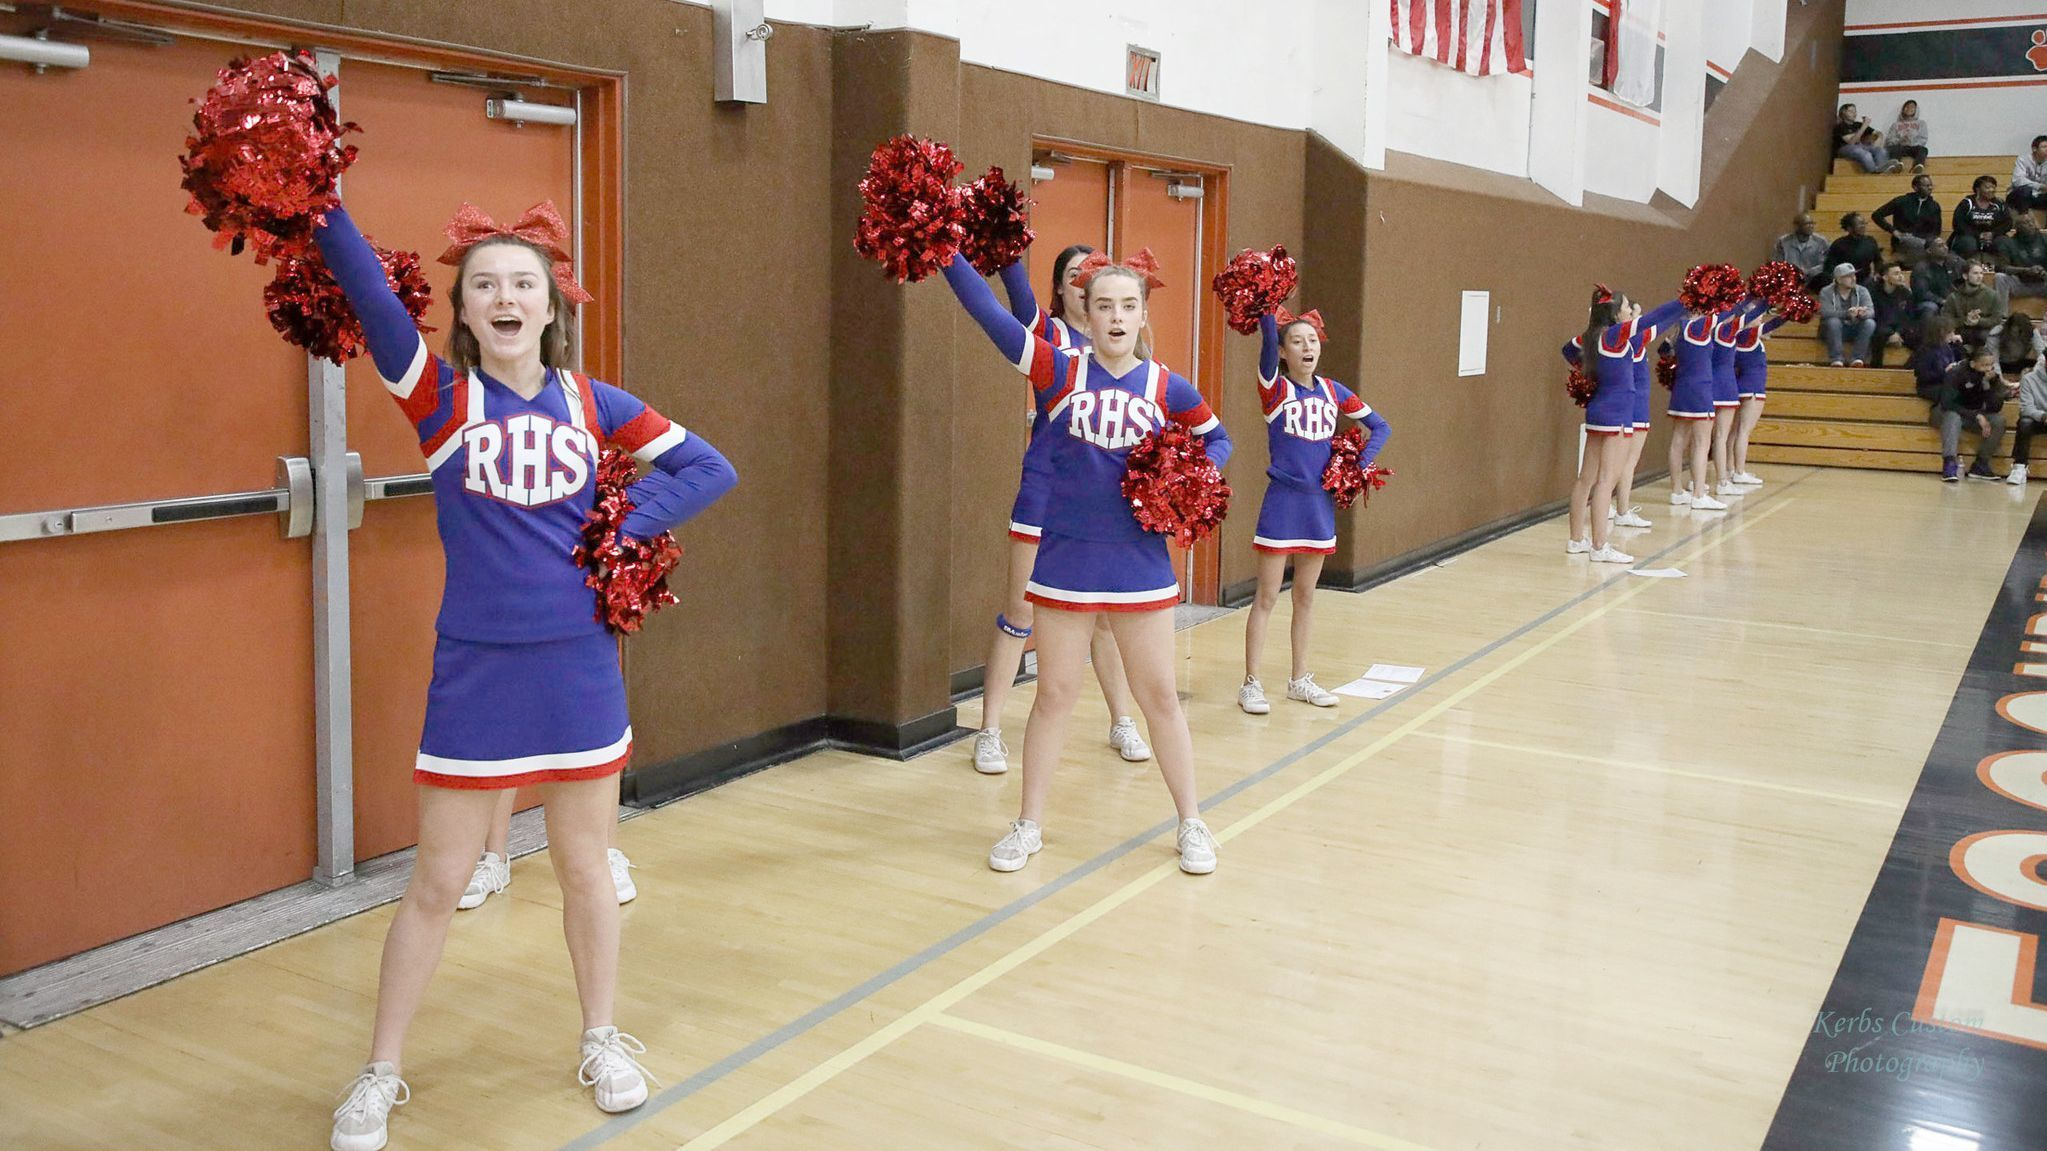 Ramona High cheerleaders rally players and fans.